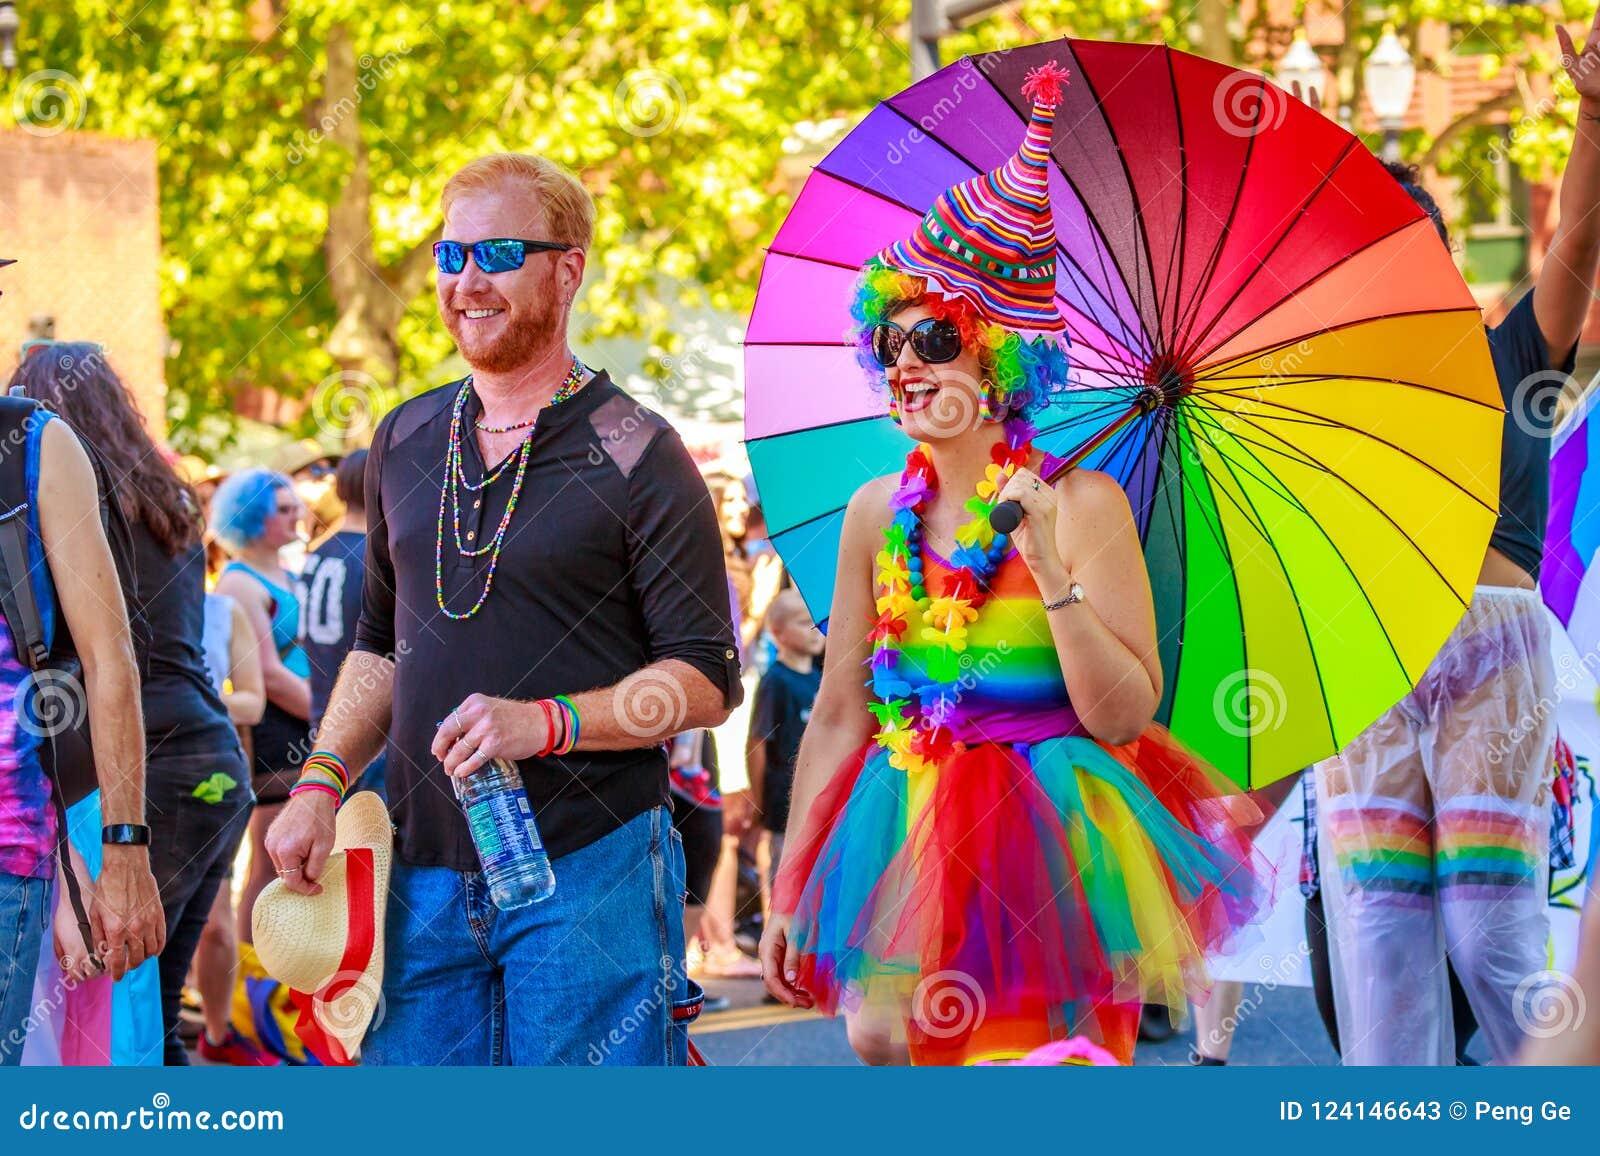 Portland Pride Parade 2018 Editorial Stock Photo Image Of America 124146643